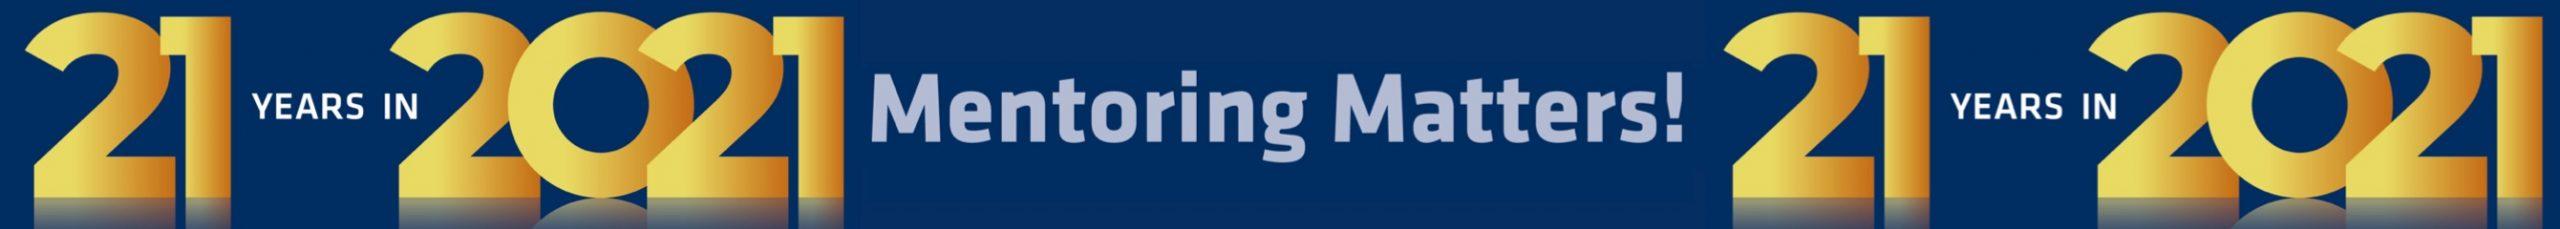 KMP+ Mentoring 21 years banner